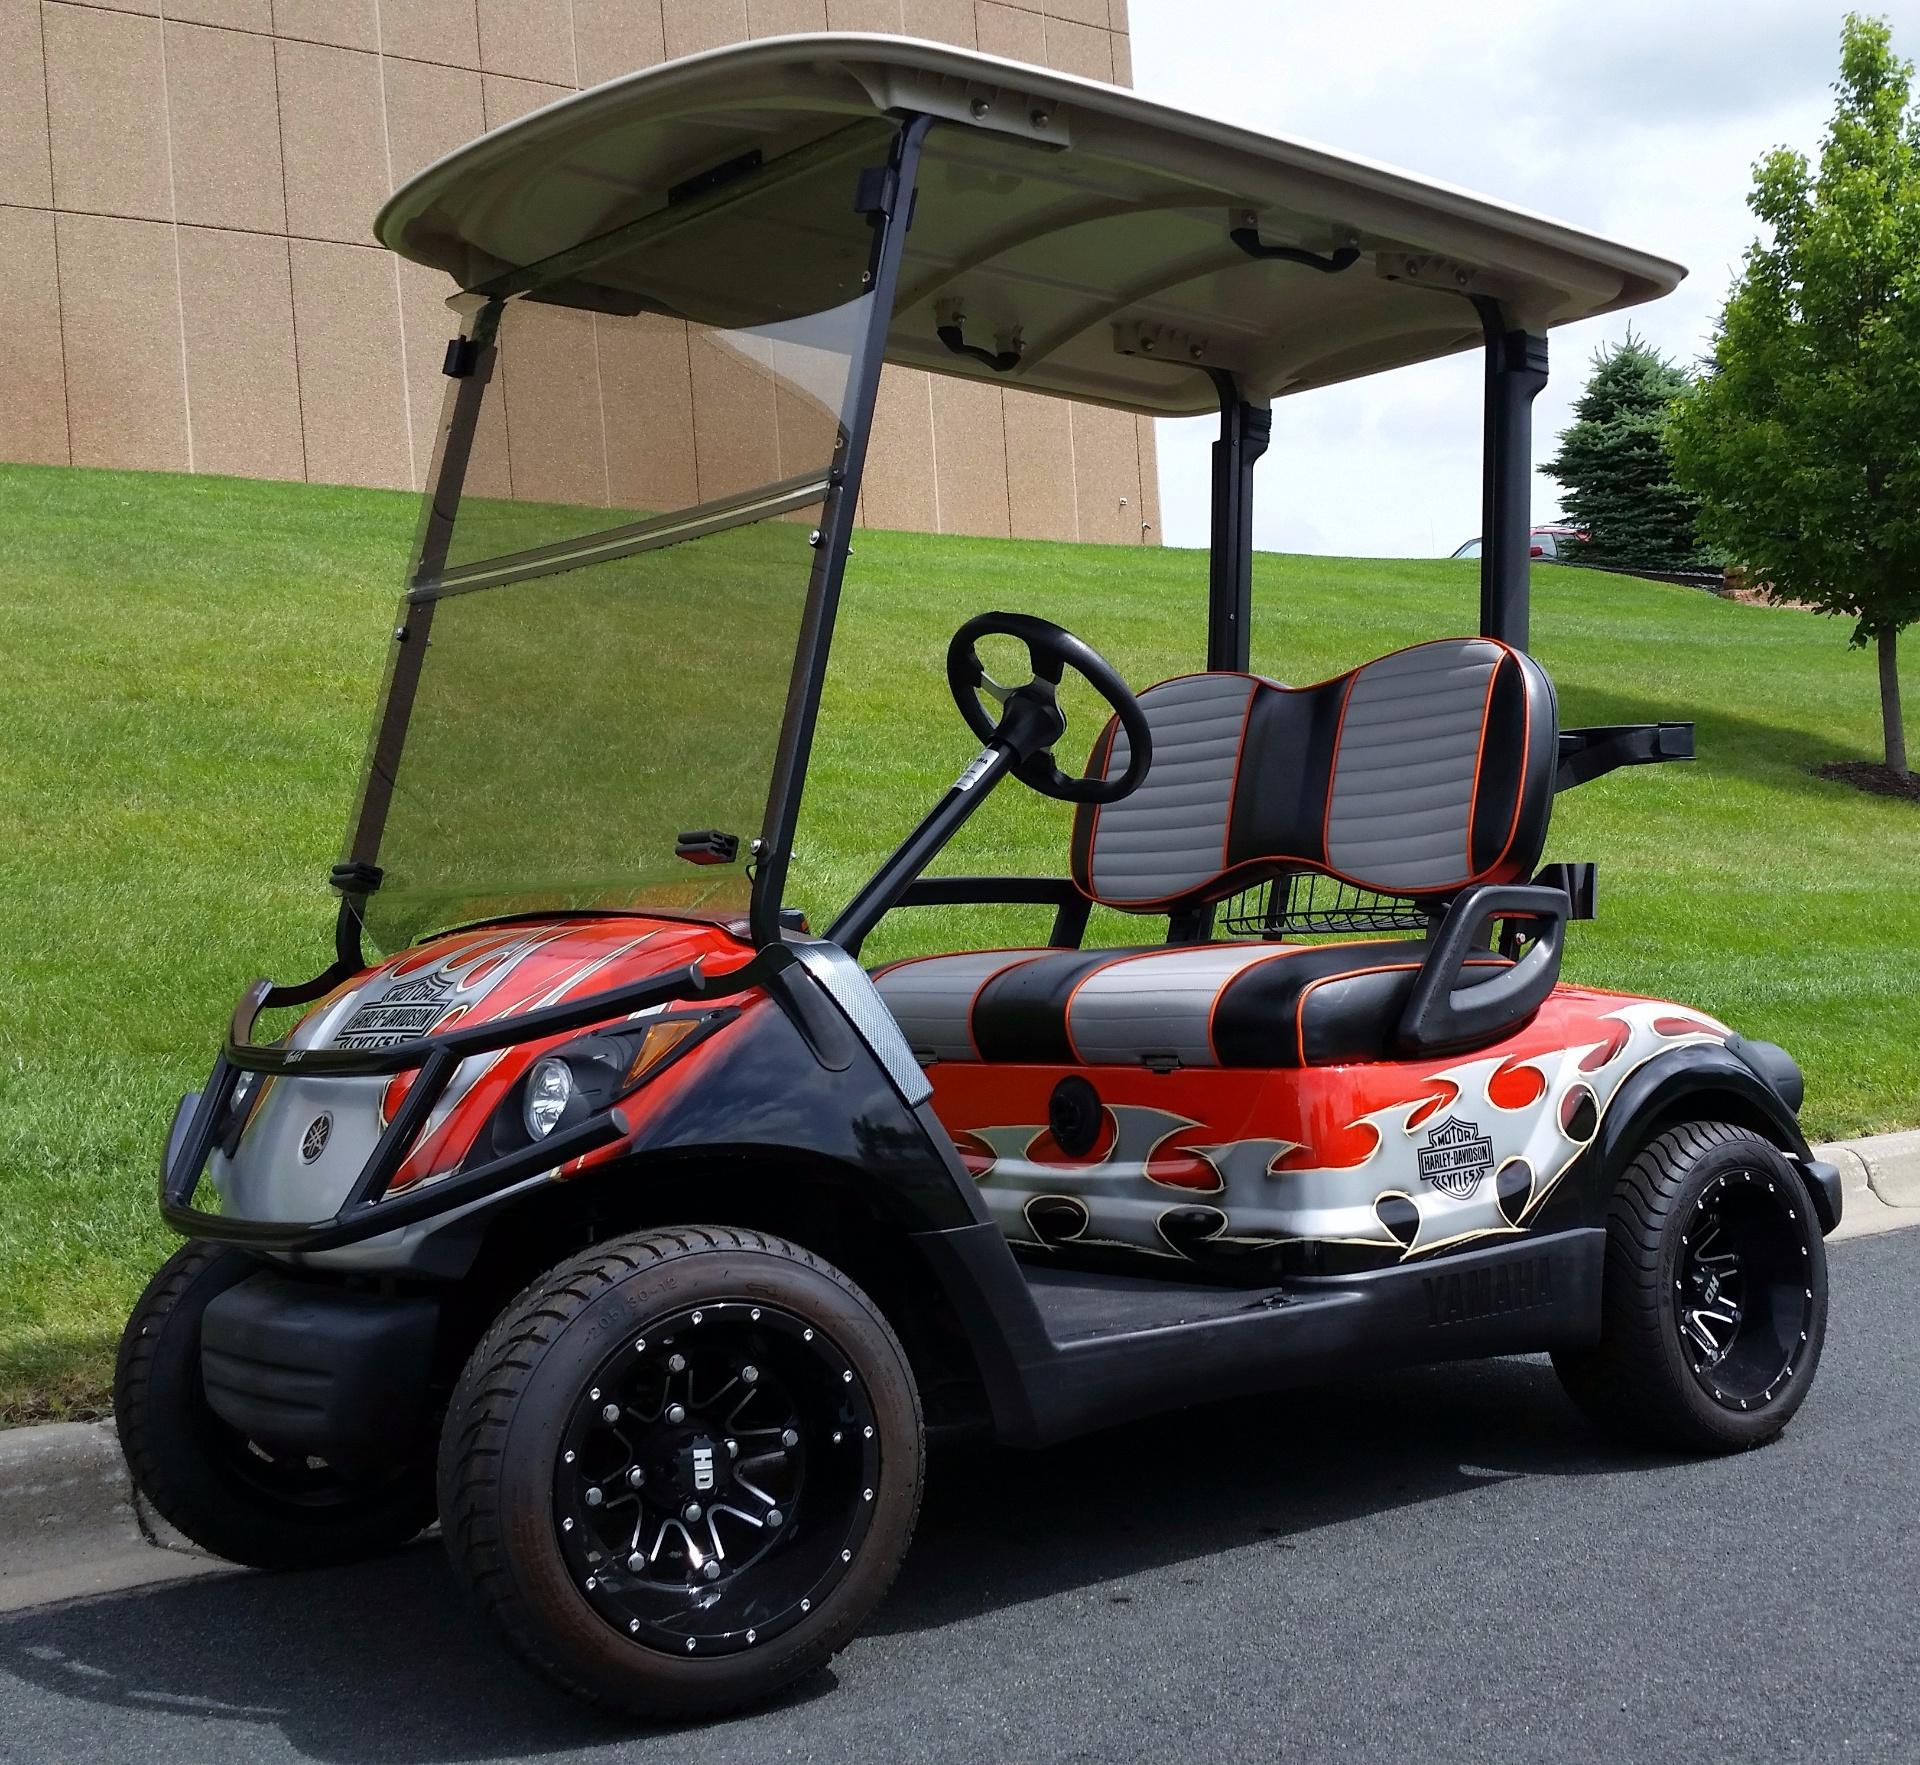 2011 yamaha drive golf carts otsego minnesota 012362 for Yamaha dealers mn